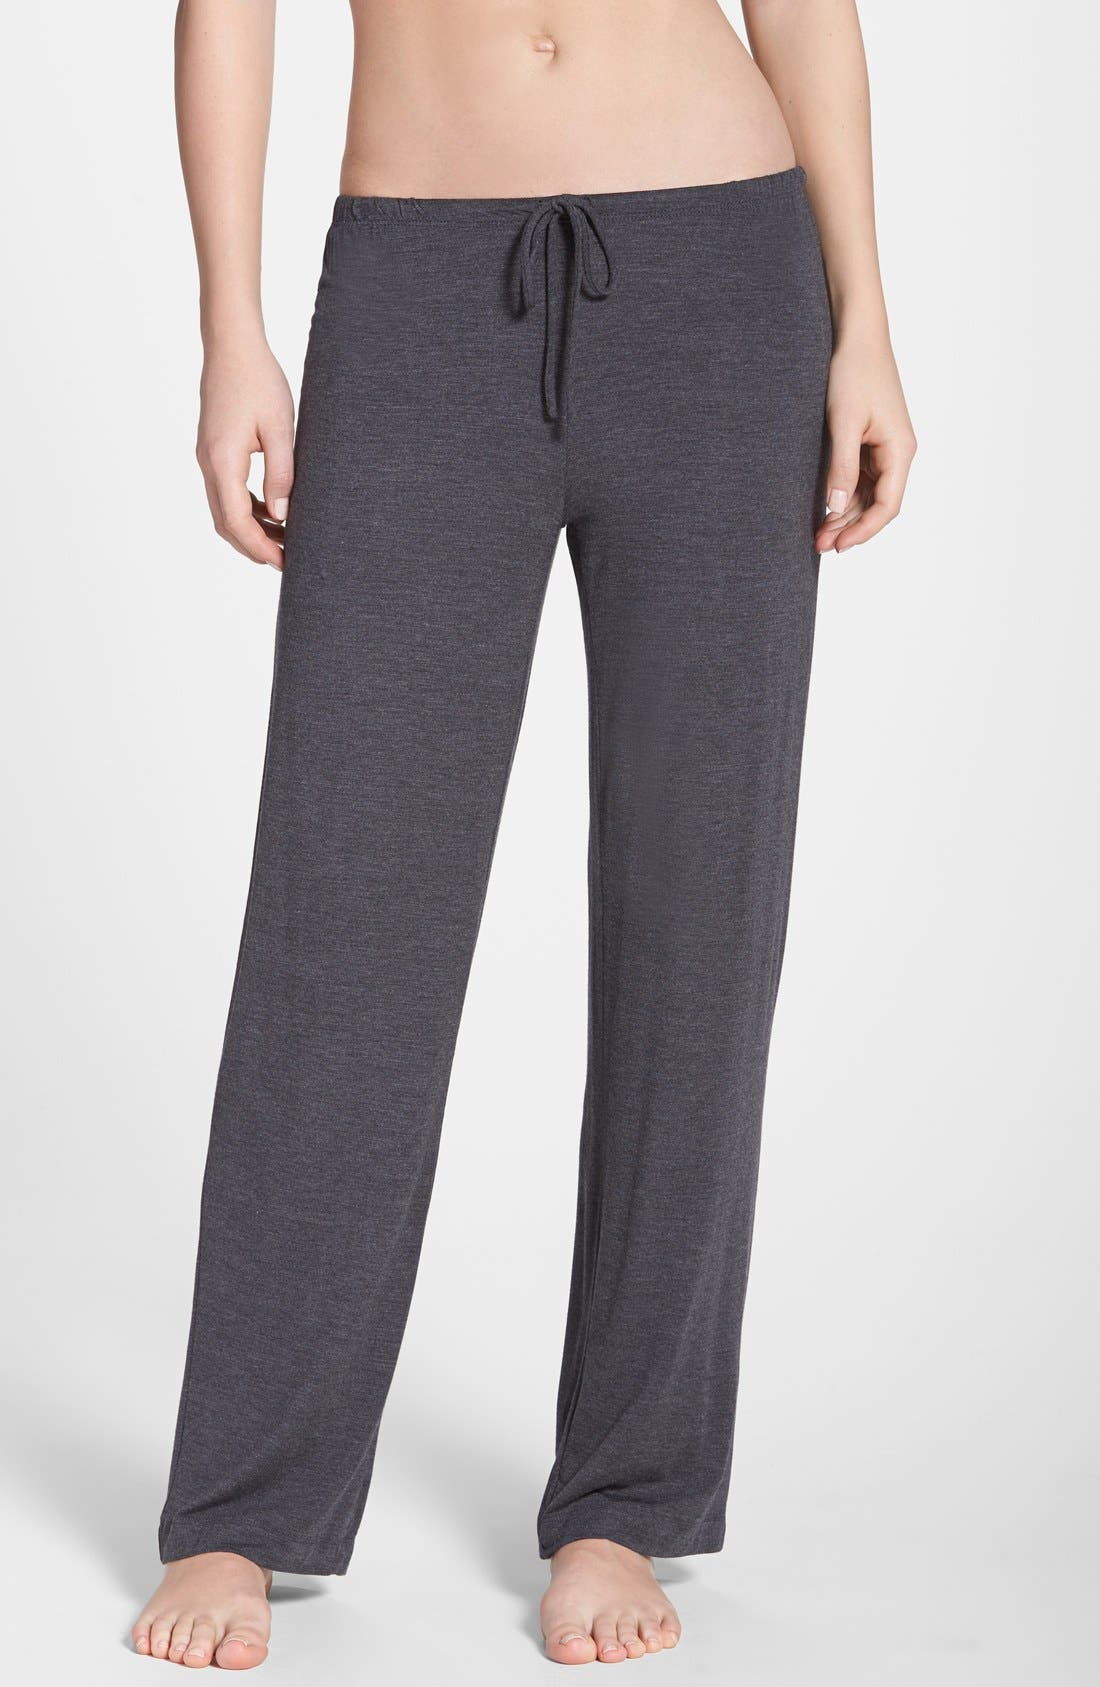 Alternate Image 1 Selected - DKNY 'Urban Essentials' Lounge Pants